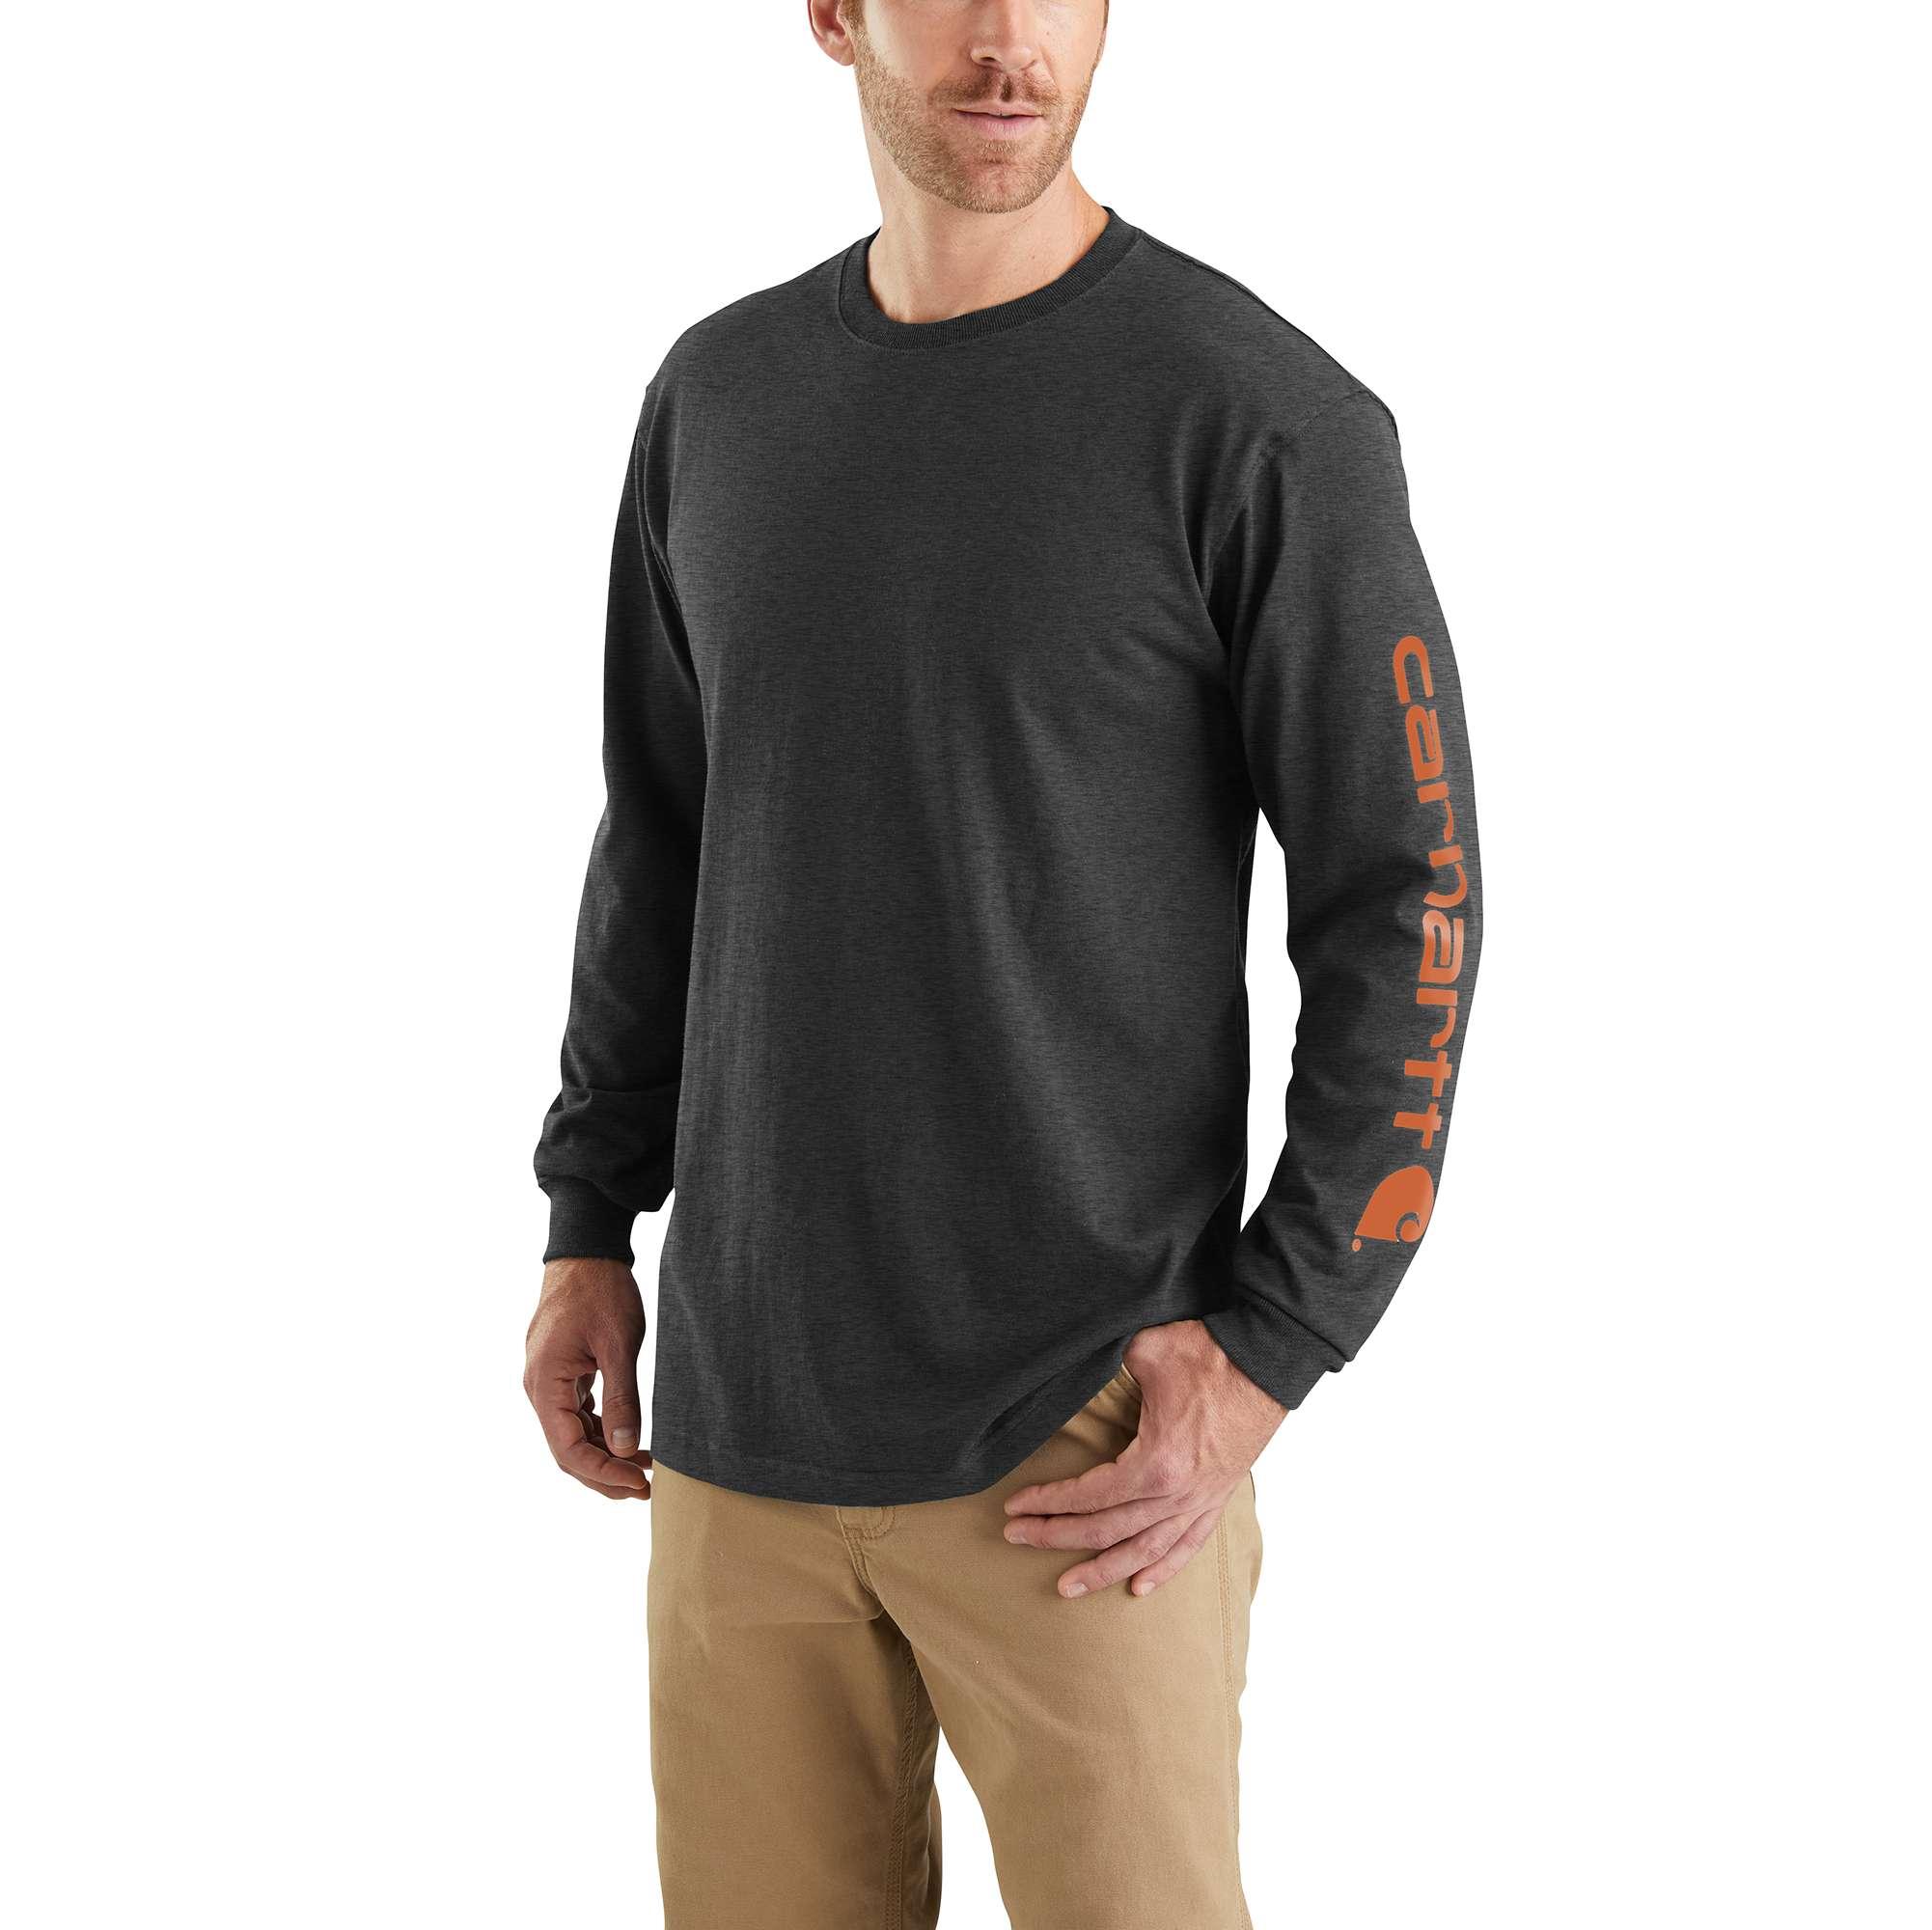 Men's  Long Sleeve Signature Logo Tall Tee, Gray, swatch